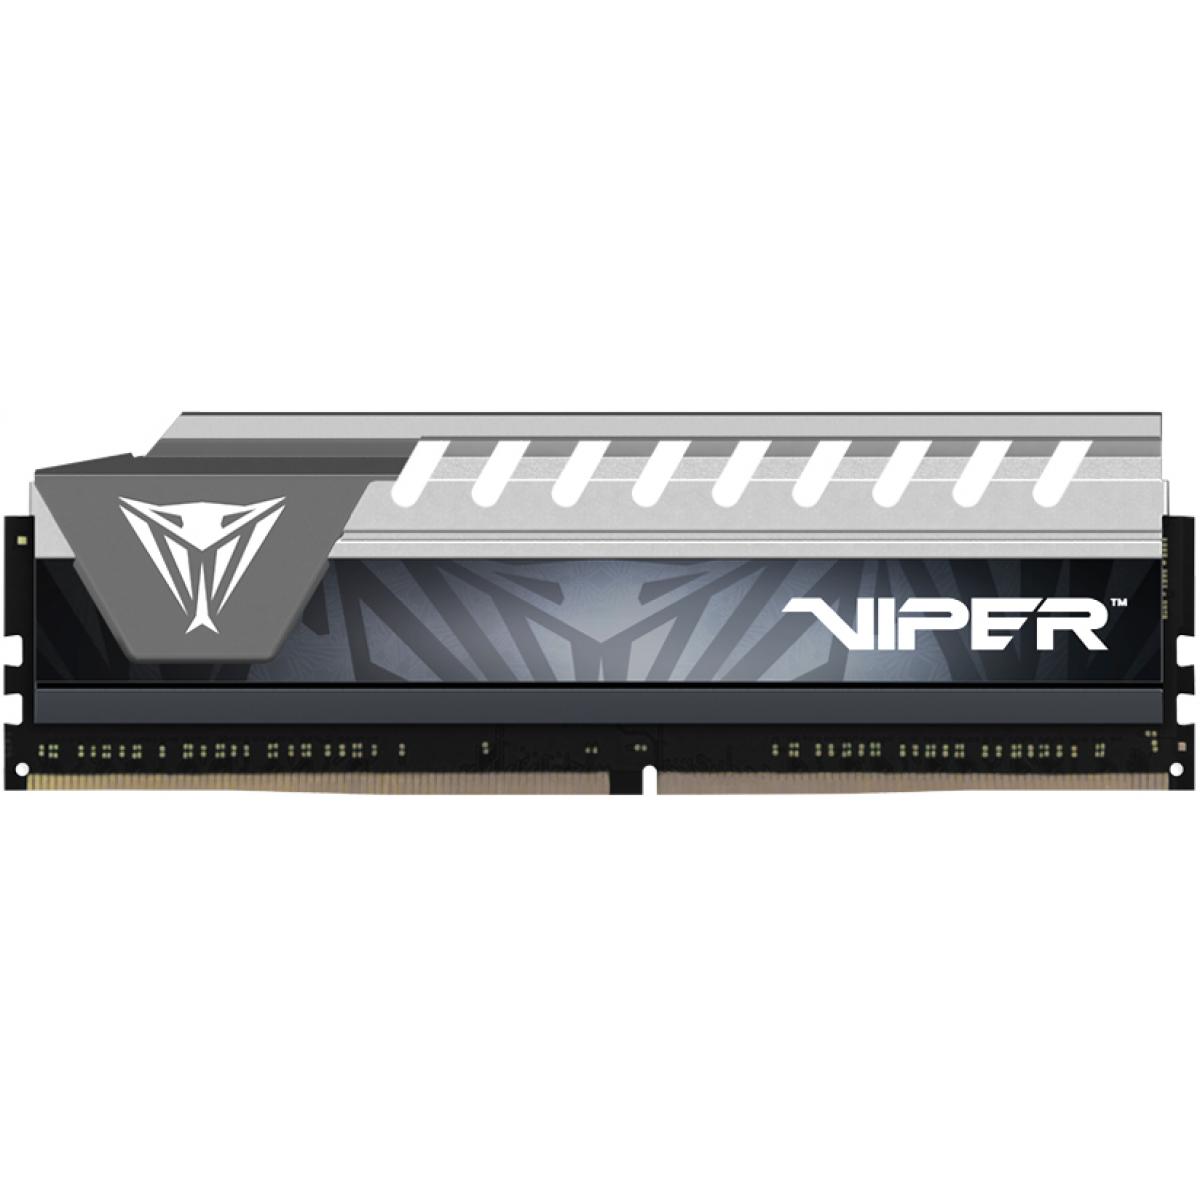 Memória DDR4 Patriot Viper Elite, 8GB 2666MHz, Silver, PVE48G266C6GY